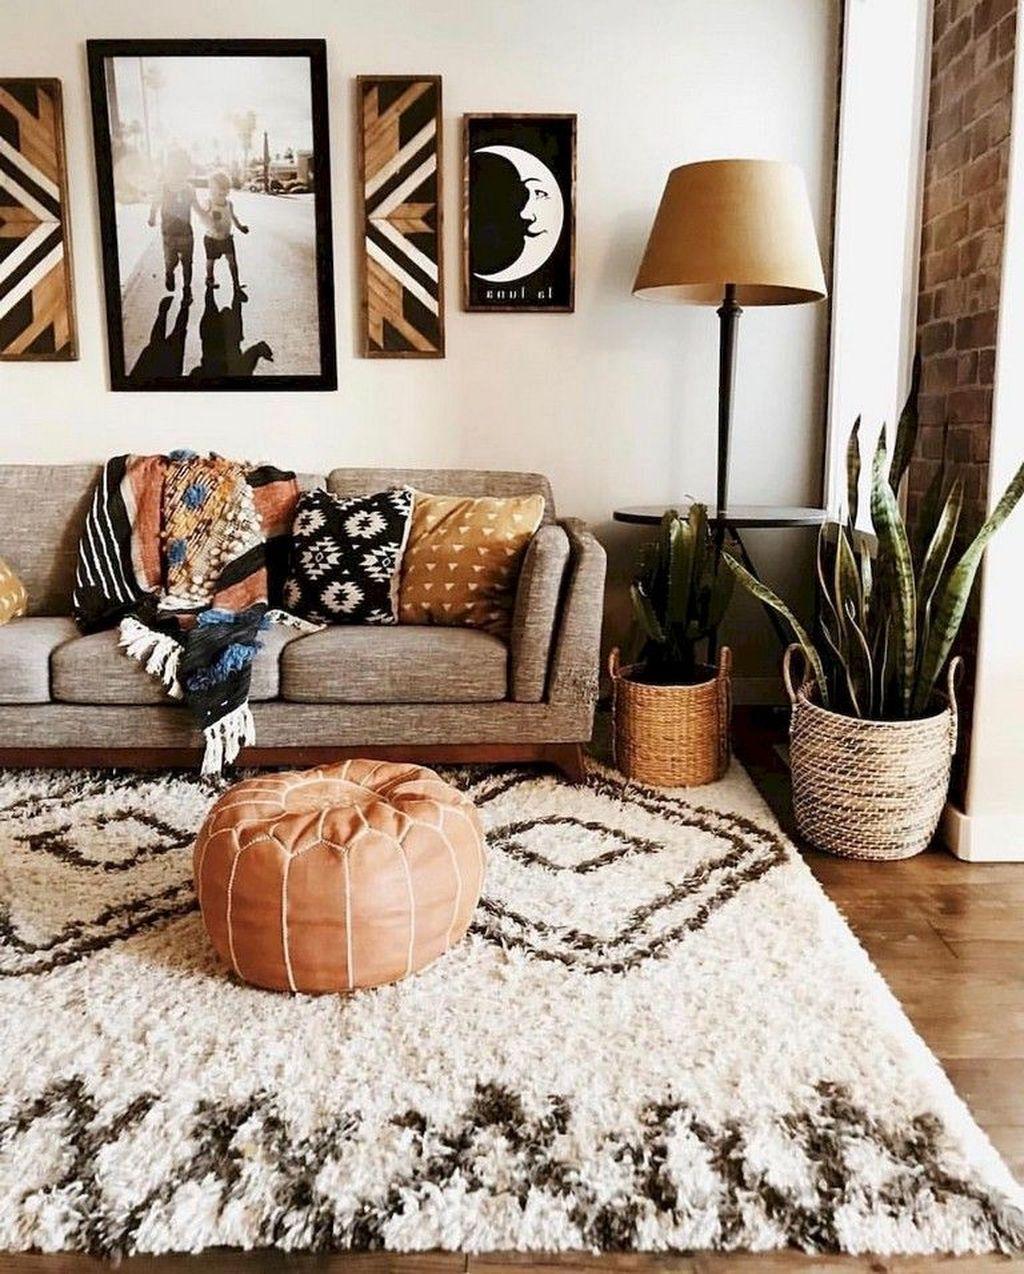 Lovely Boho Chic Apartment Decor Ideas Modern Bohemian Living Room Living Room Decor Apartment Bohemian Living Room Decor